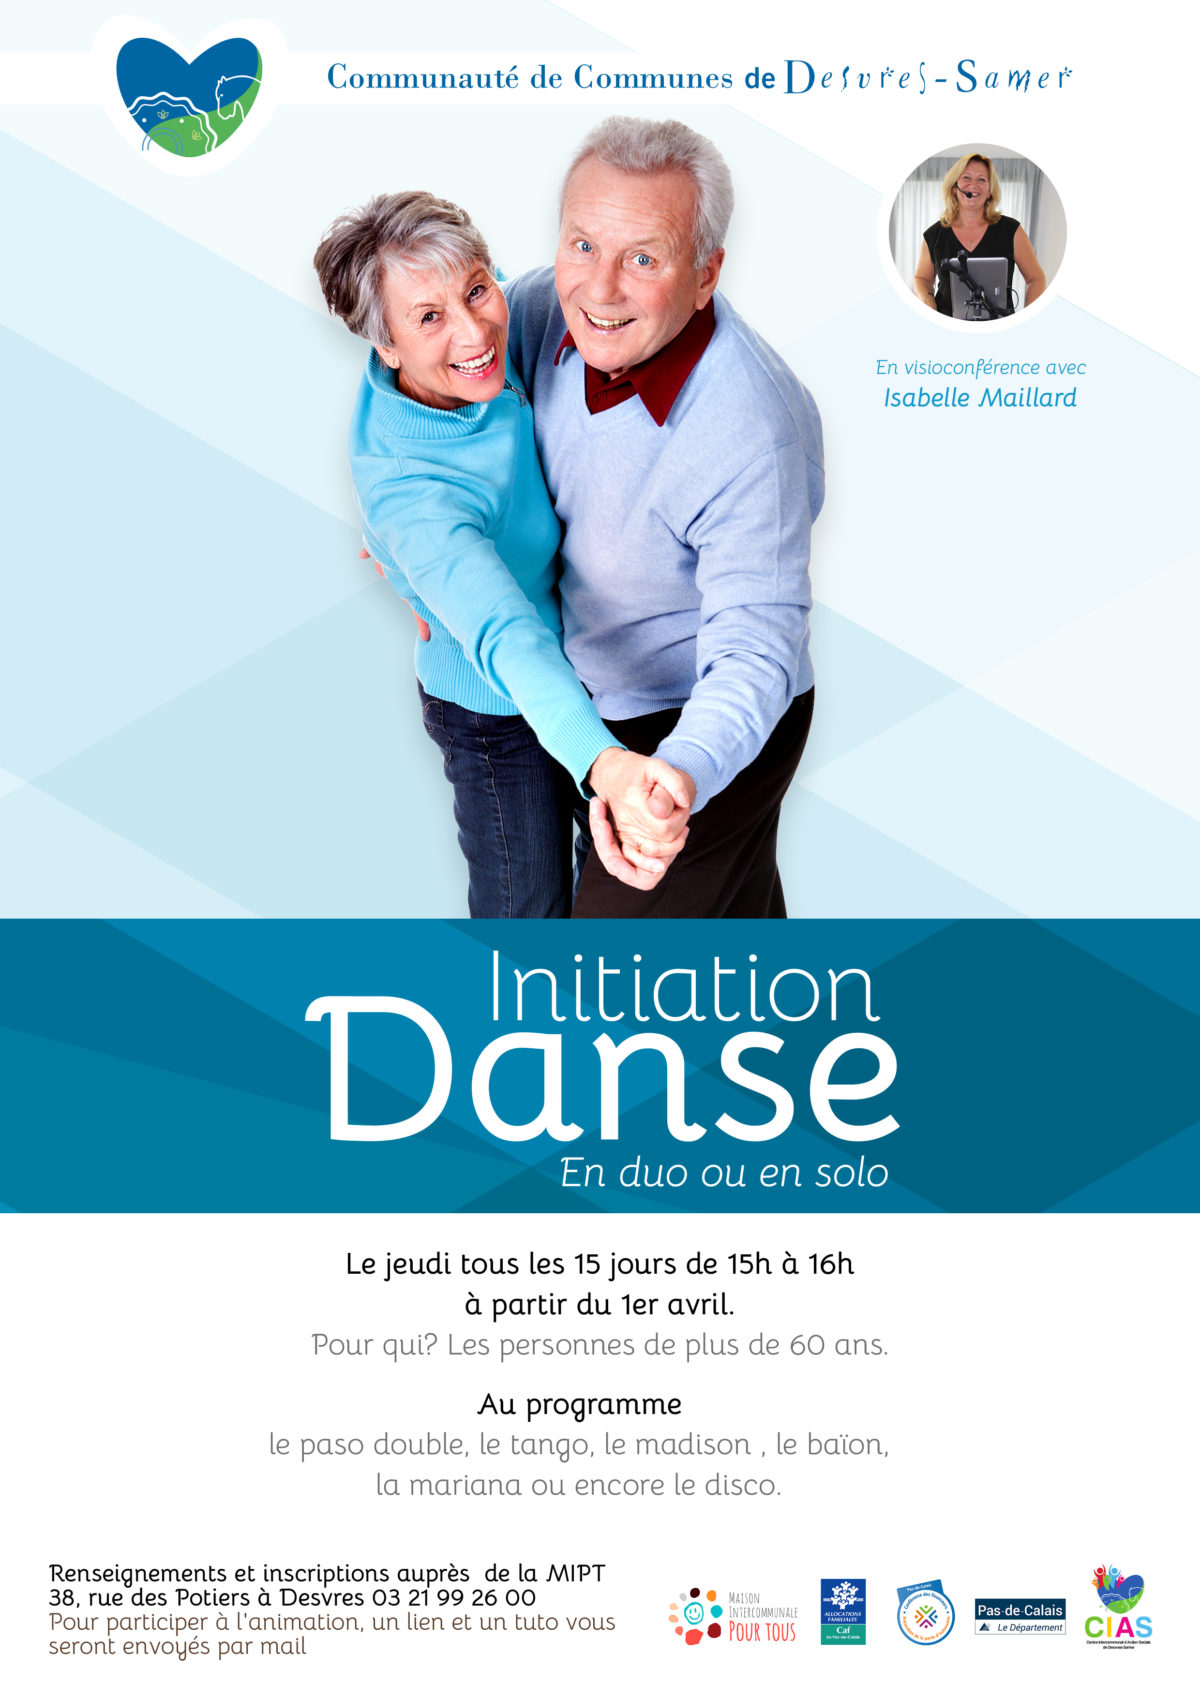 Initiation danse en visioconférence avec Isabelle Maillard